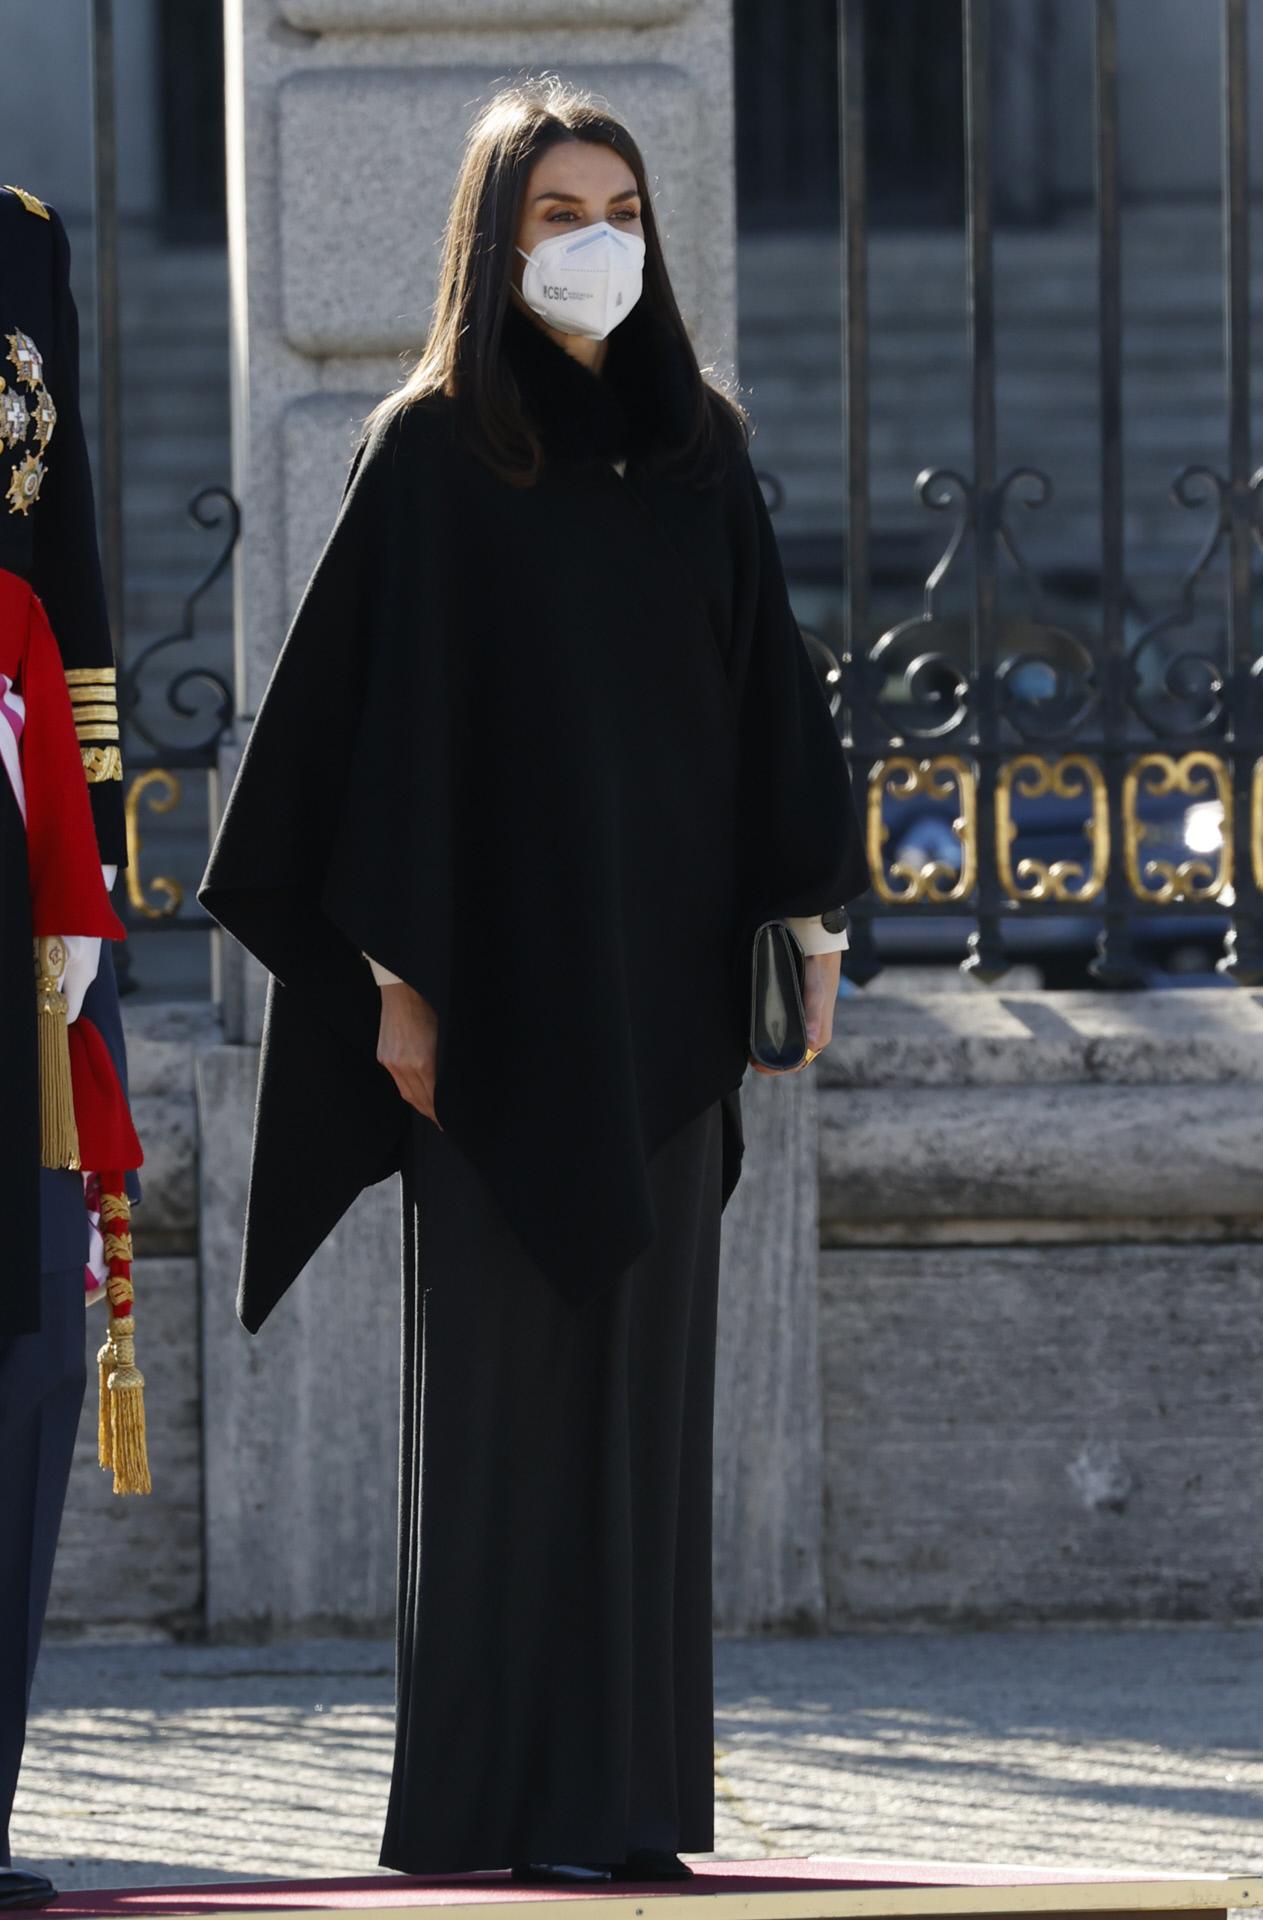 La reina Letizia durante la celebración de la Pascua Militar 2021.